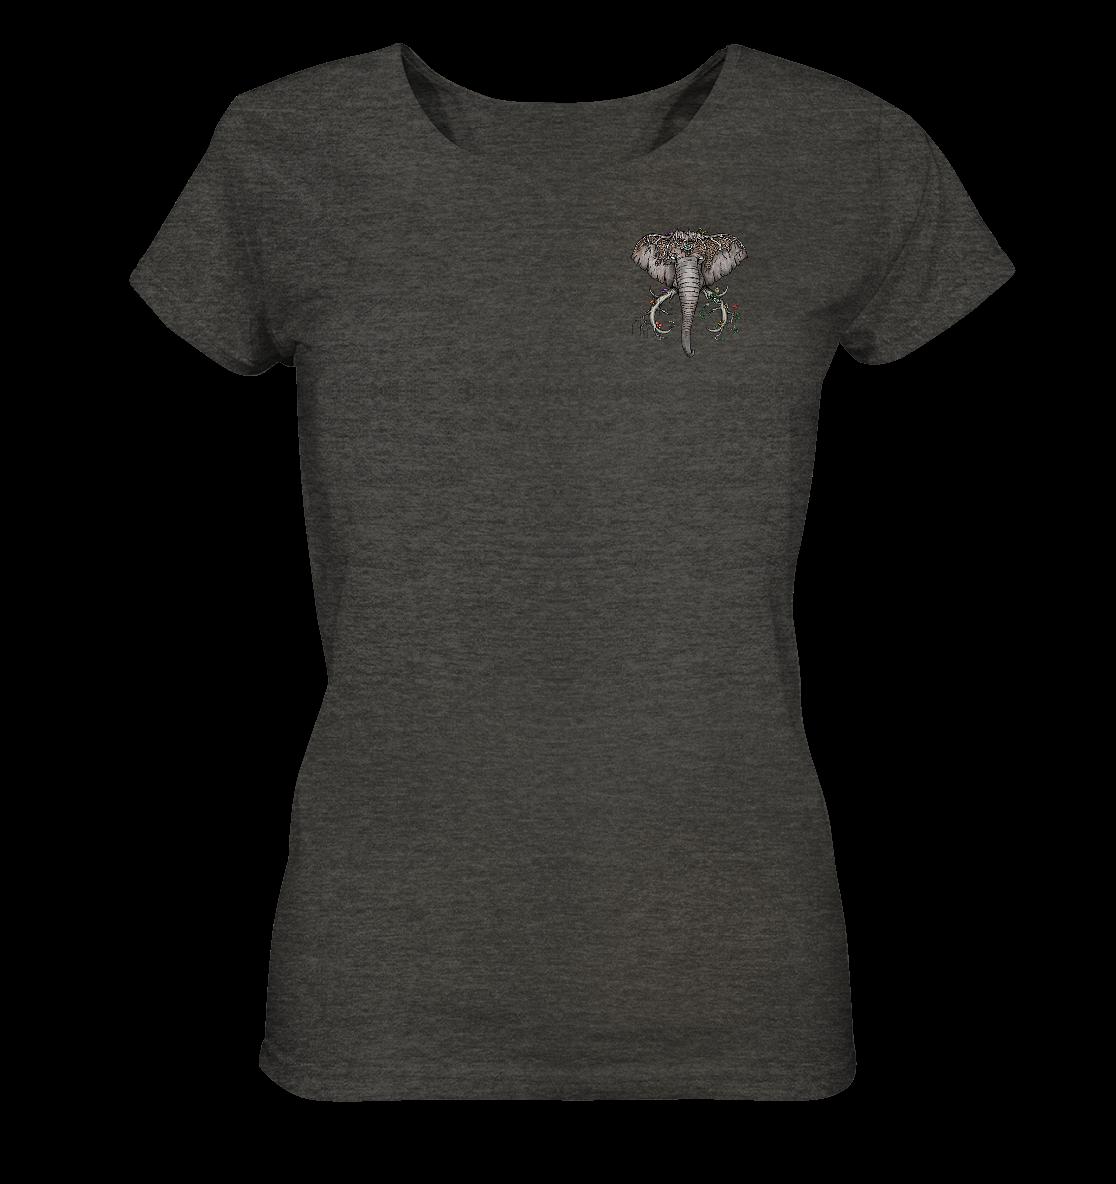 front-ladies-organic-shirt-meliert-252625-1116x-2.png